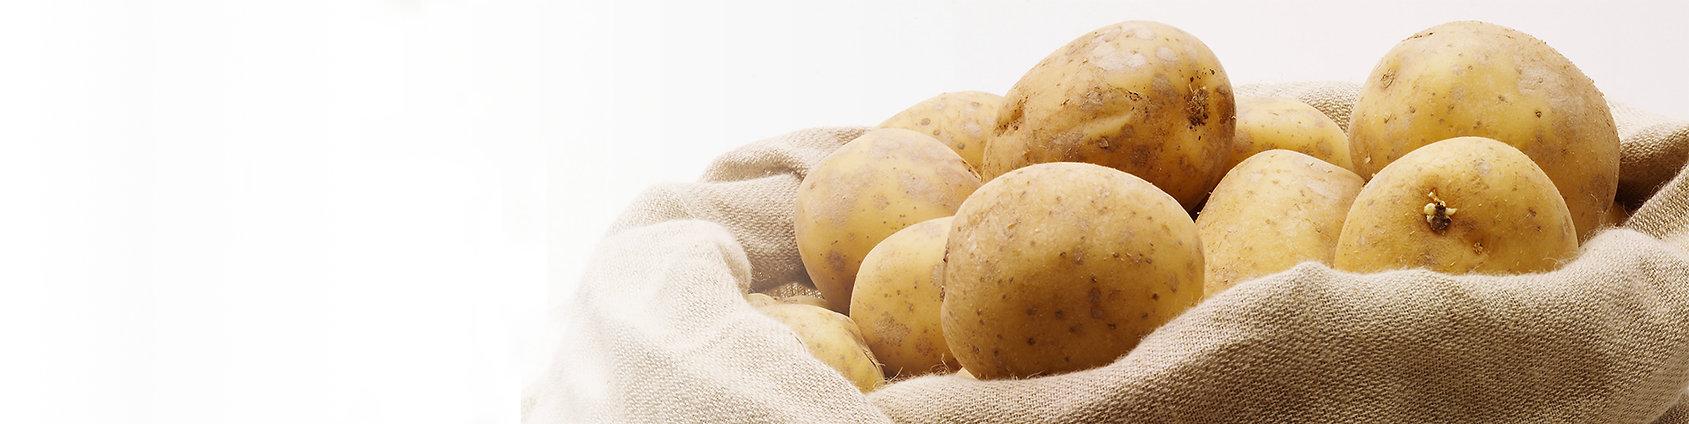 Curry & Company Oregon Potatoes